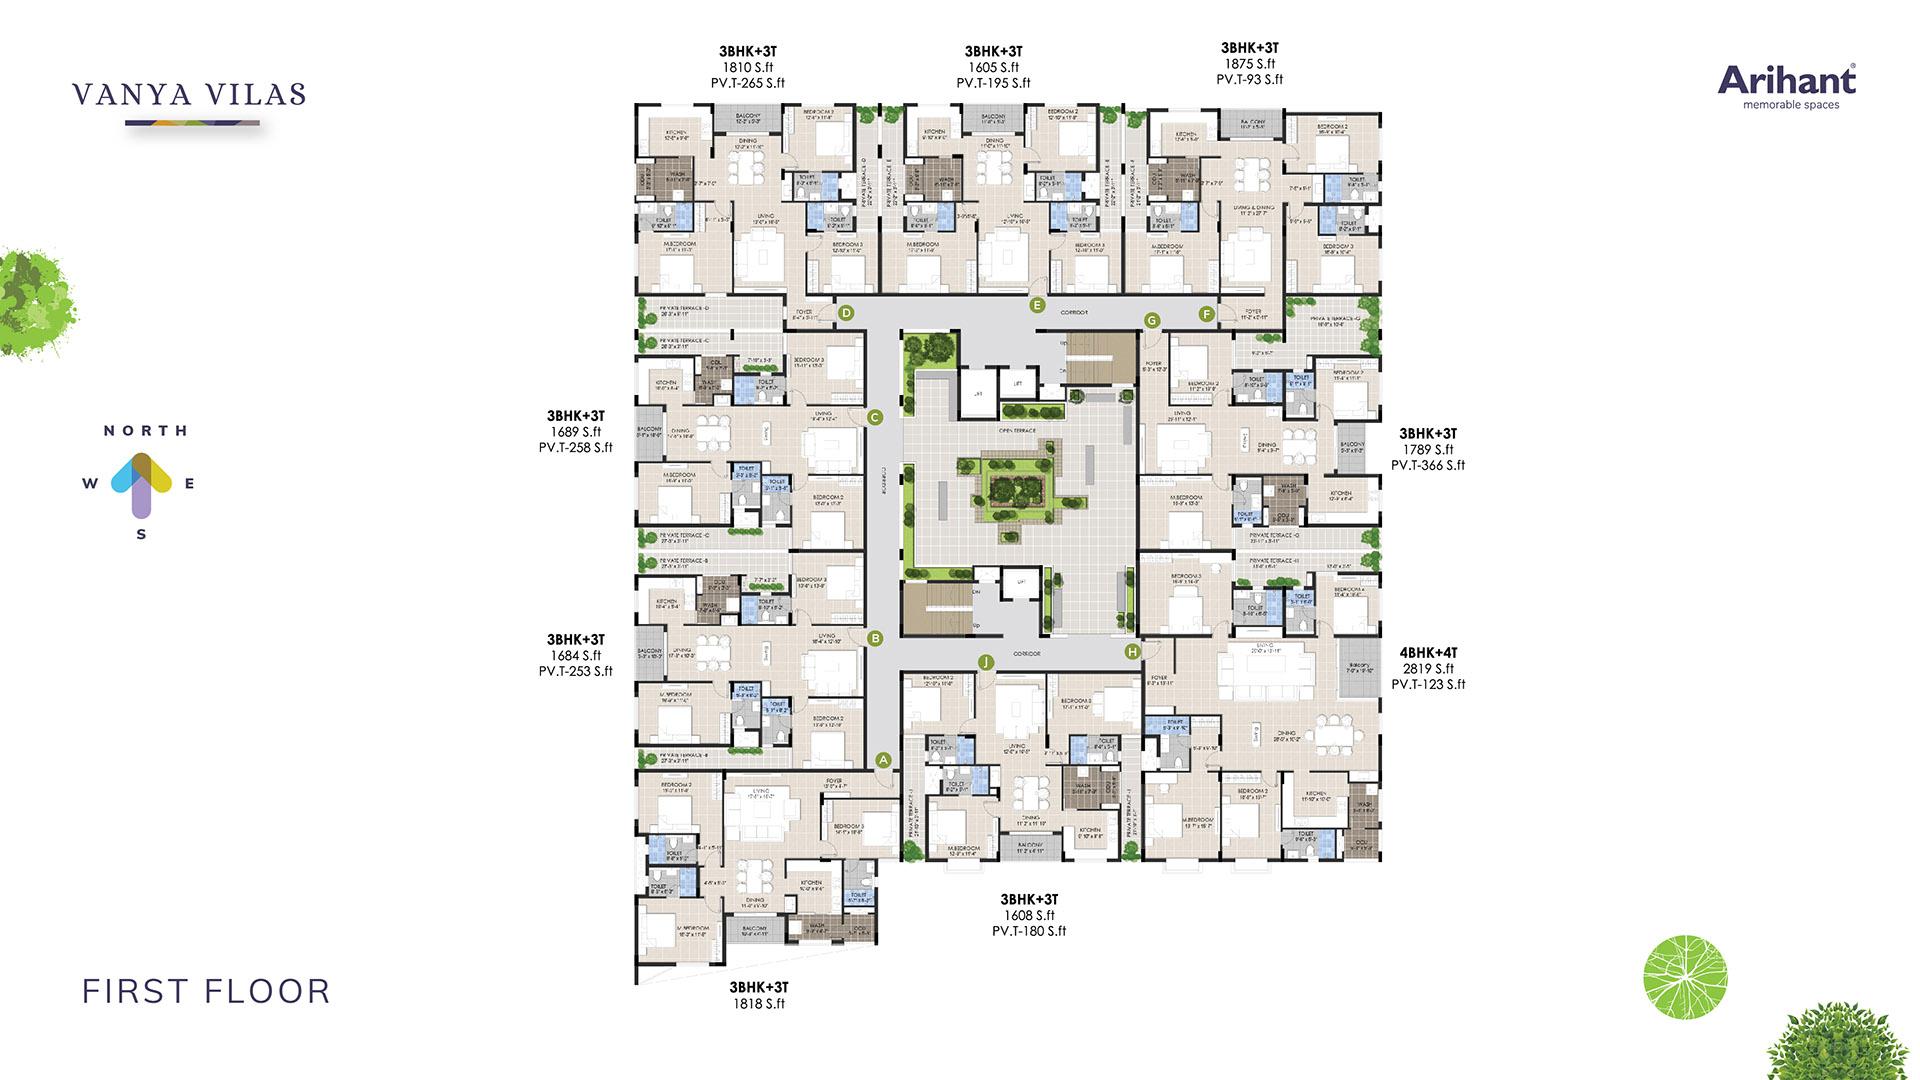 2 Arihant Vanya Vilas First Floor